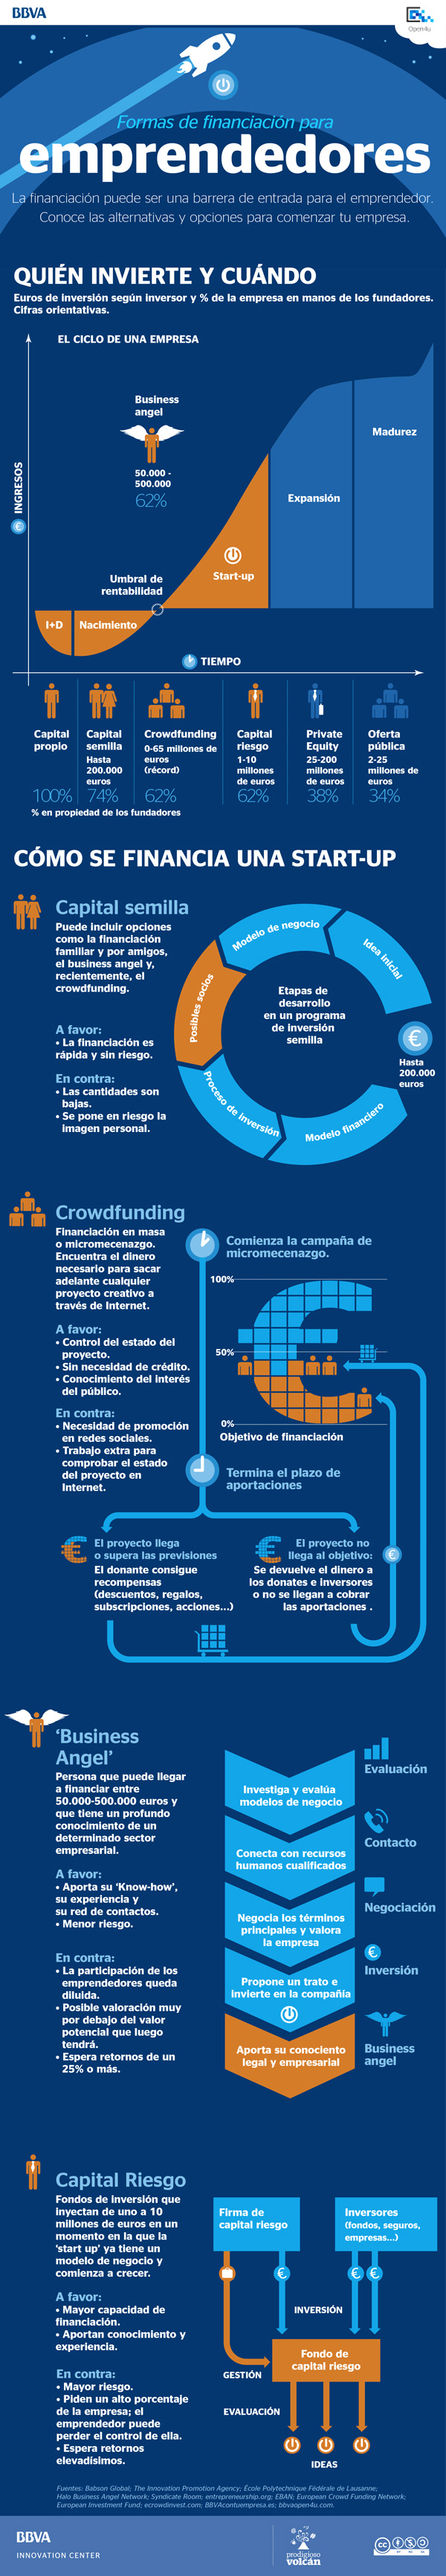 Formas de financiación para emprendedores